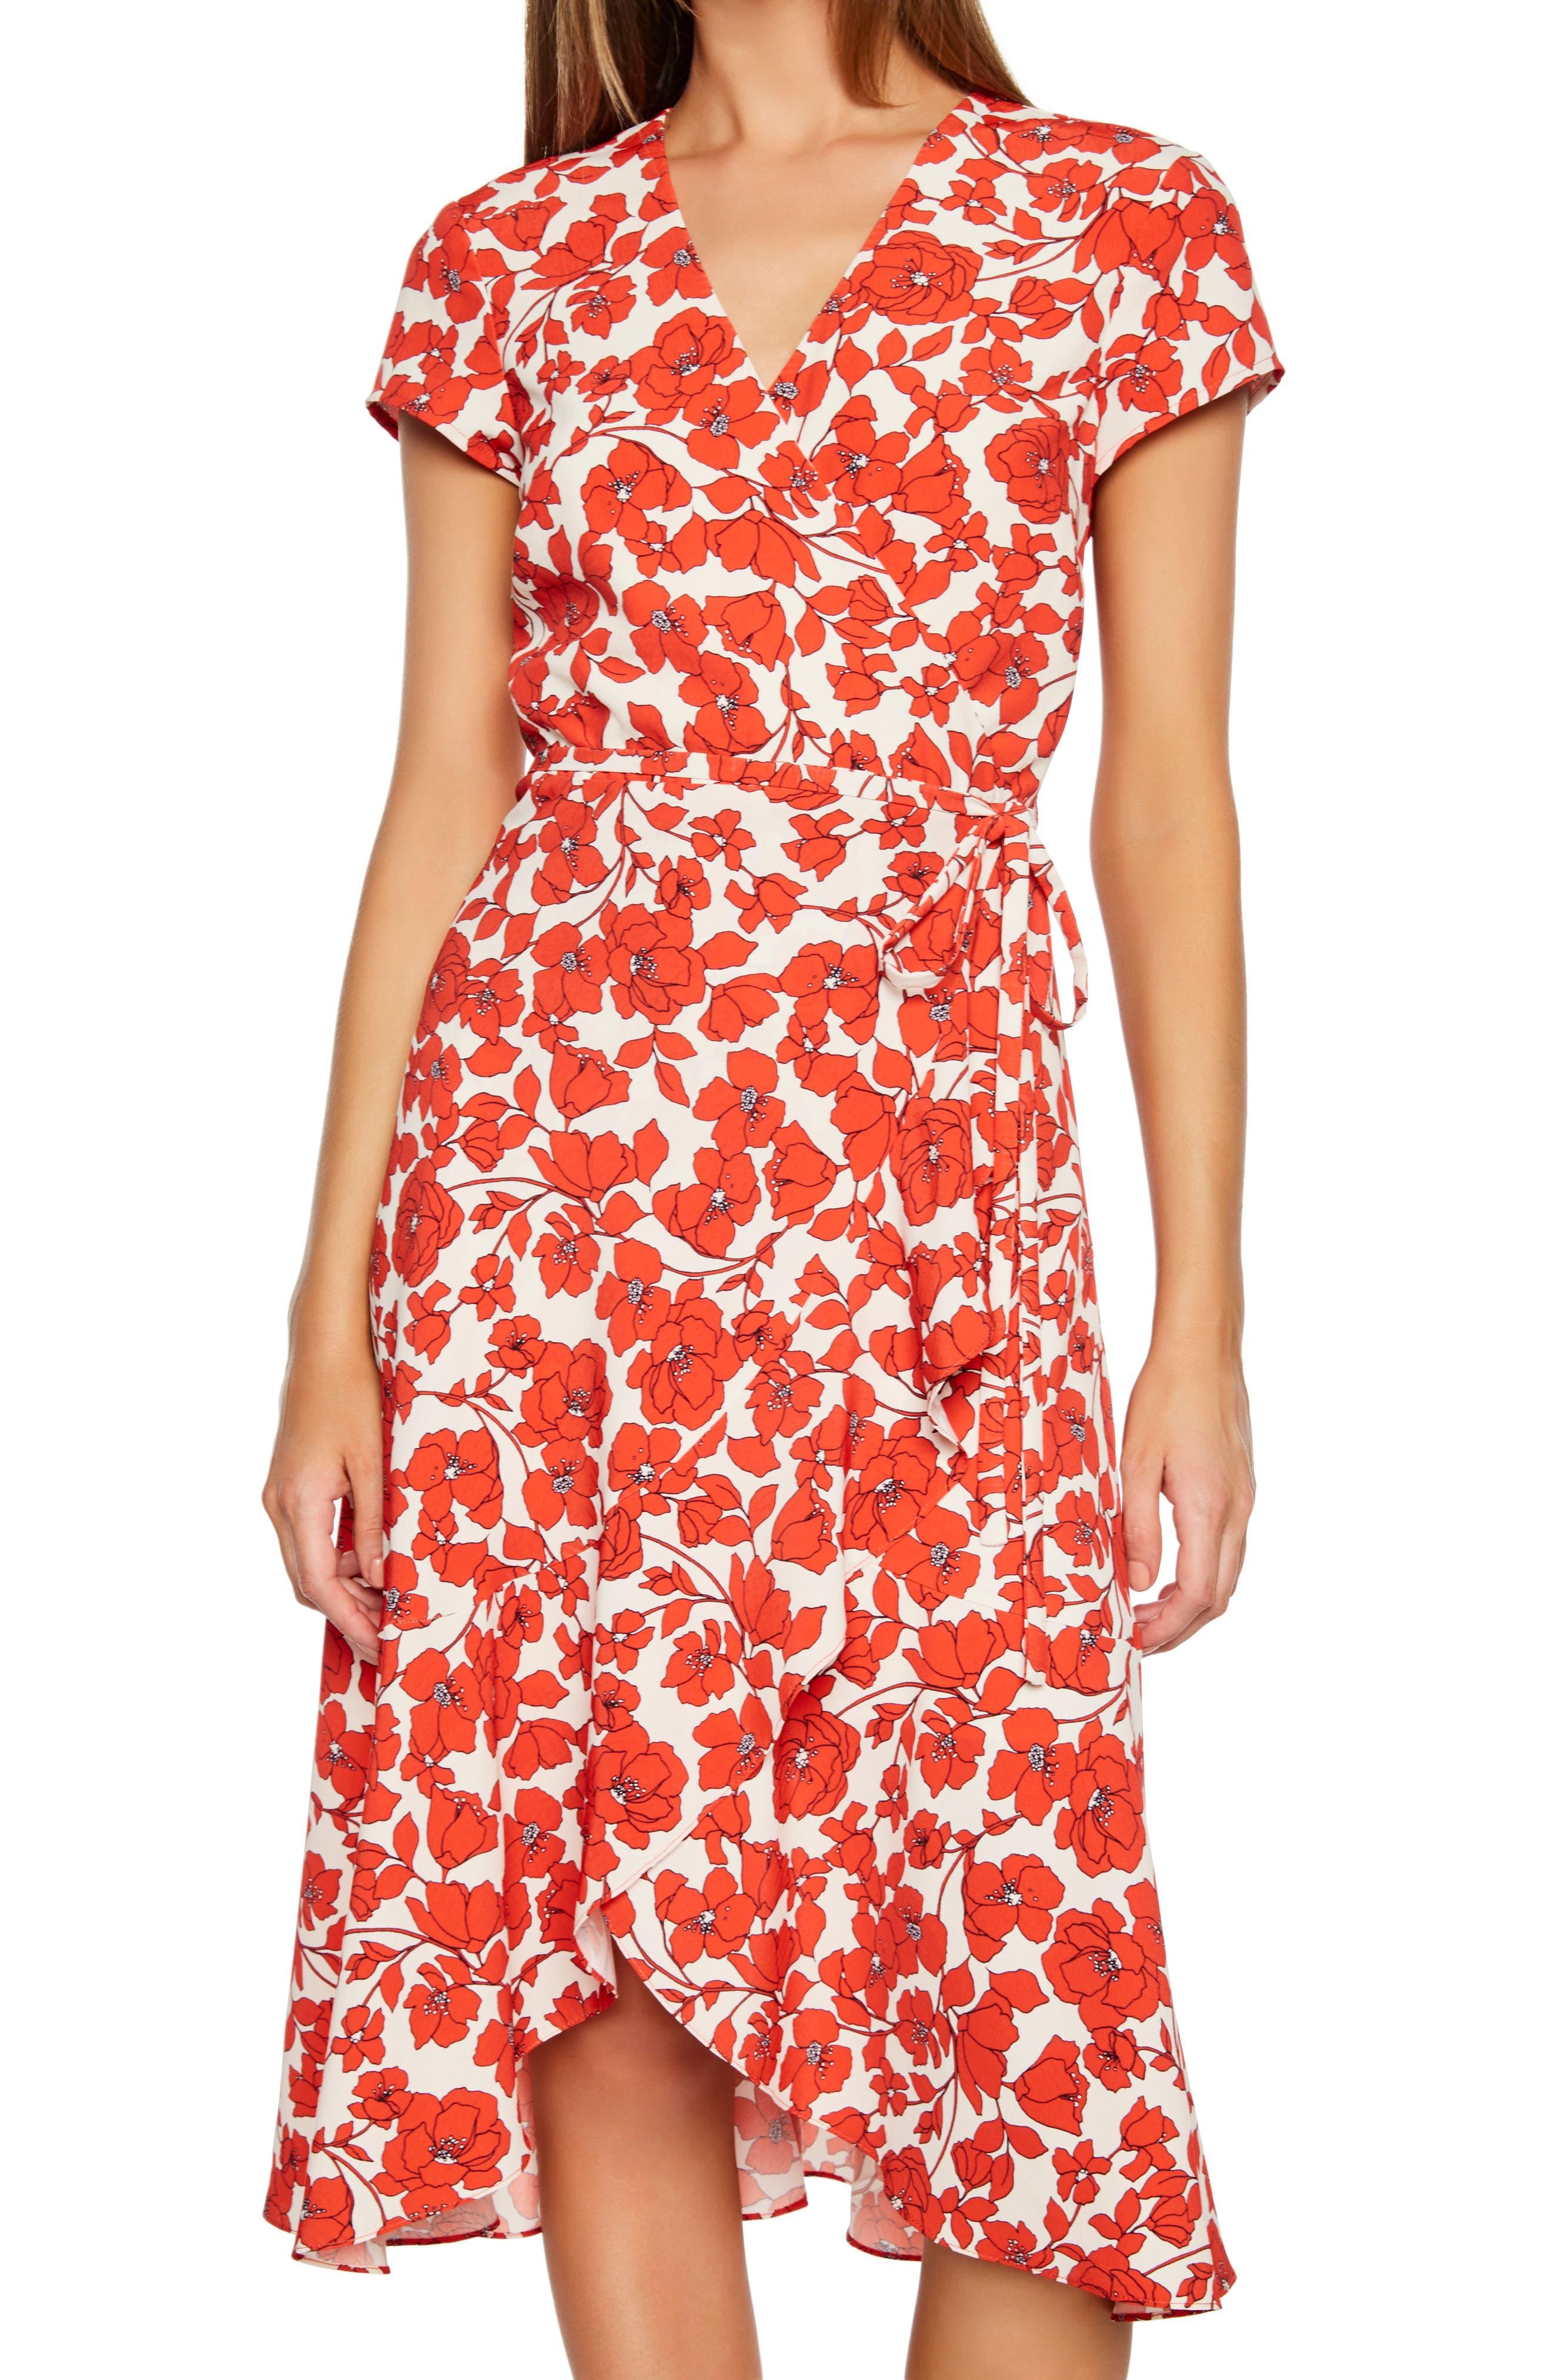 BARDOT, Fiesta Floral Midi Dress, Alternate thumbnail 5, color, 800